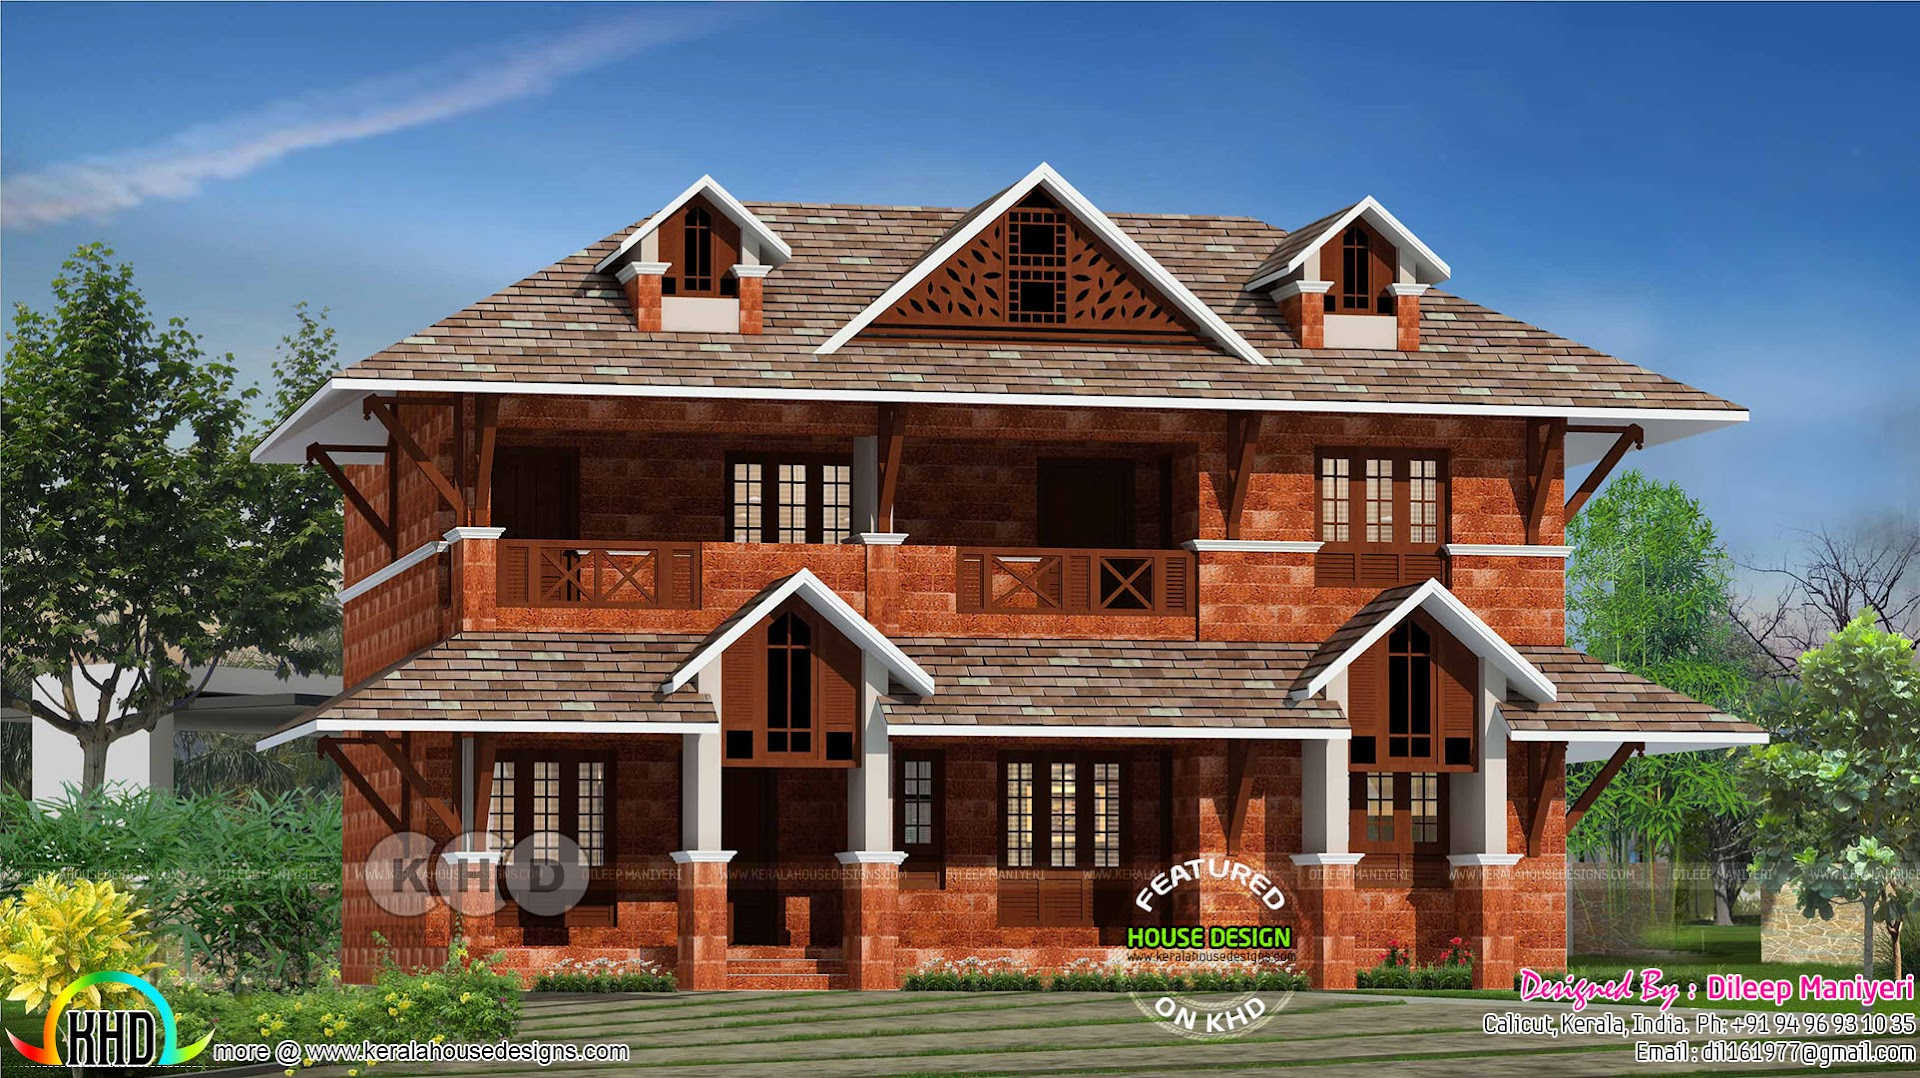 Kerala Laterite Stone Home Design 2200 Sq Ft Kerala Home Design Bloglovin